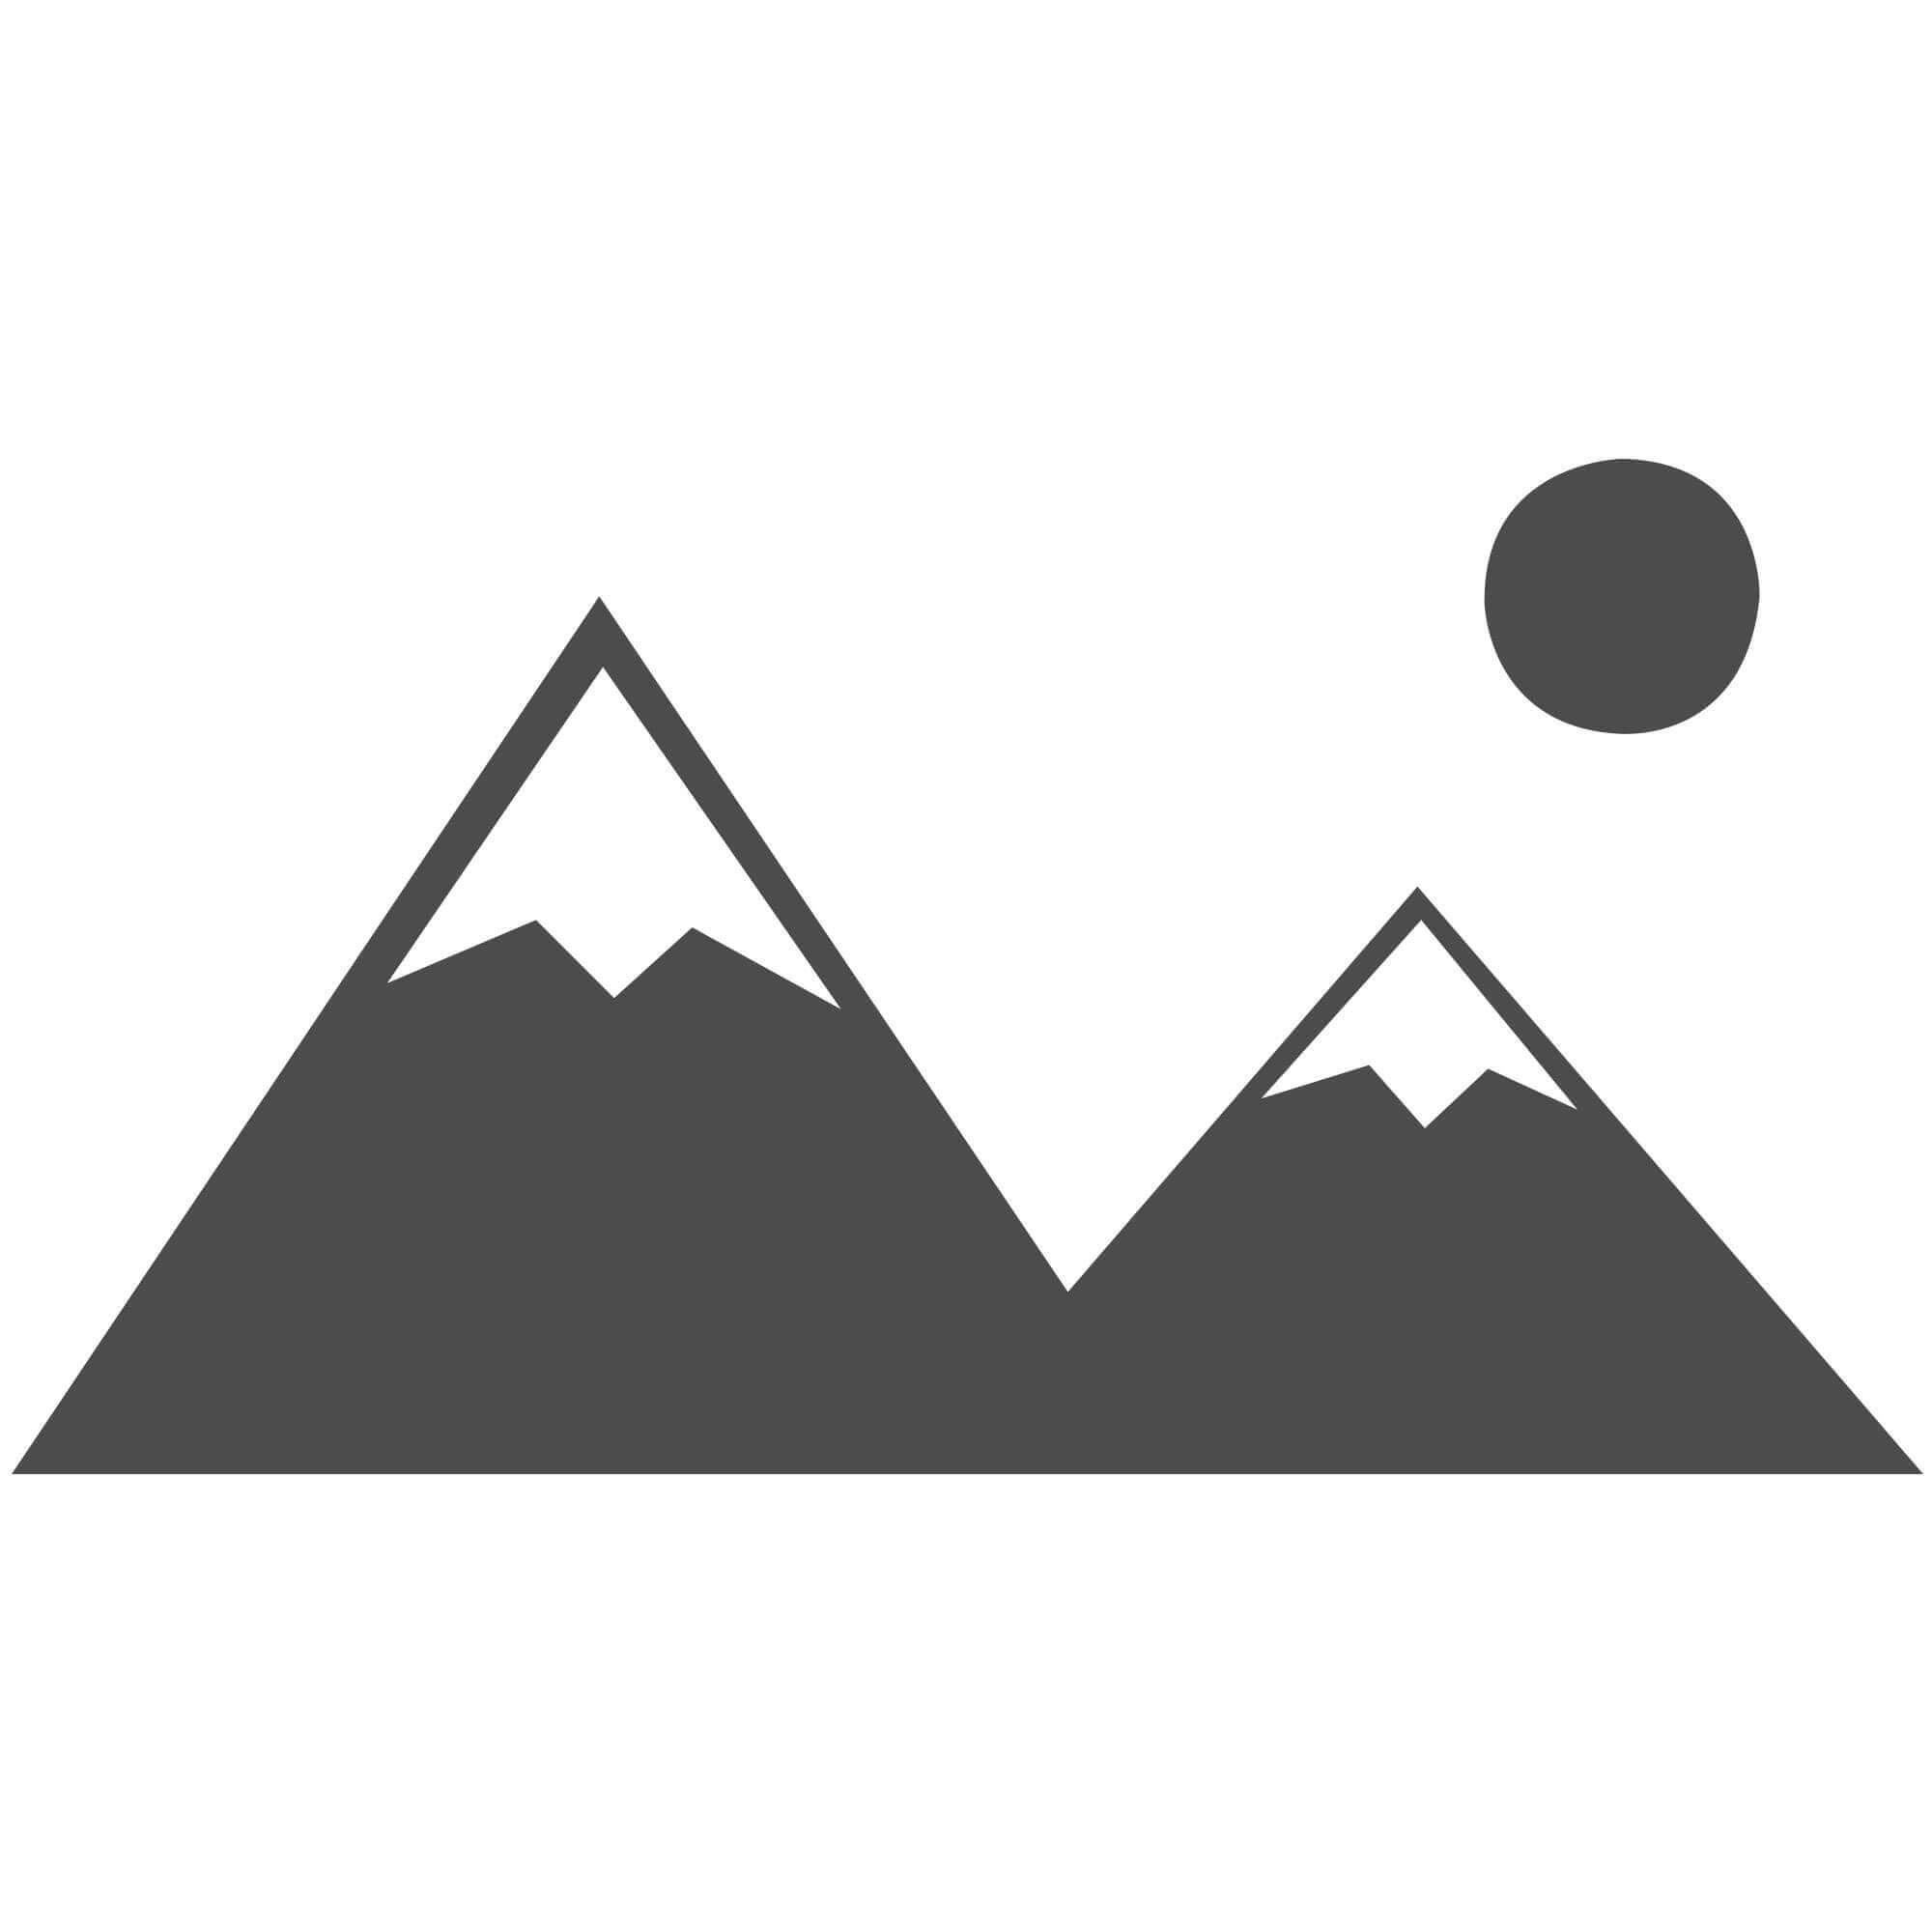 "Lulu Shaggy Rug - Sorbet Red - Size 160 x 230 cm (5'3"" x 7'7"")"